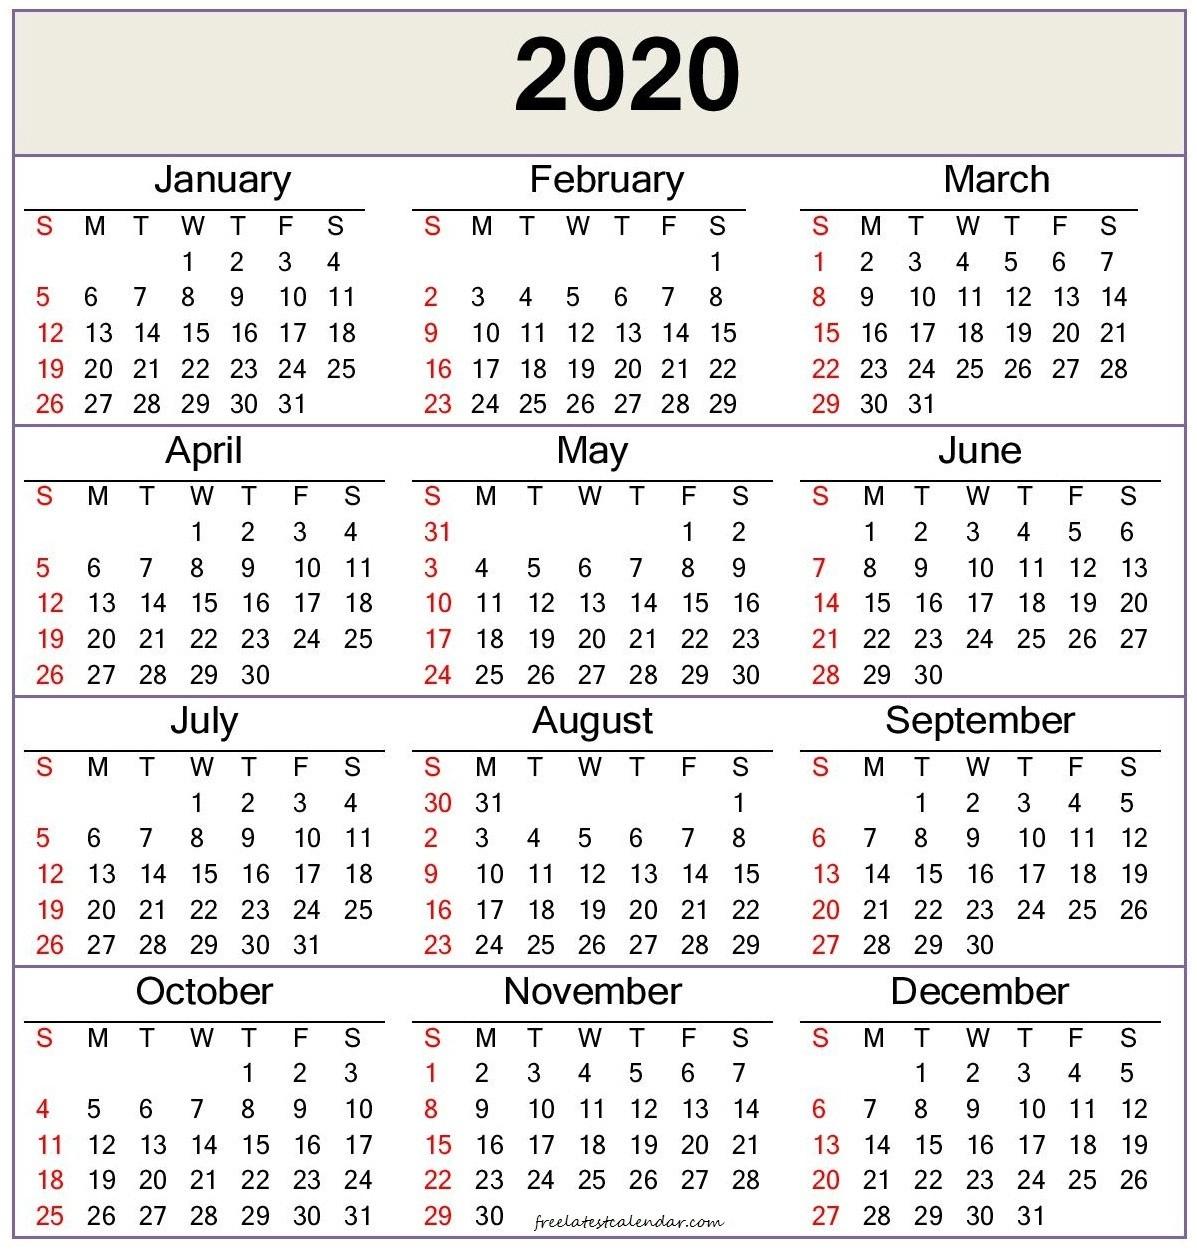 2020 Calendar Template — Word, Pdf - Freelatest Calendar Perky Calendar Template Months On One Page Word